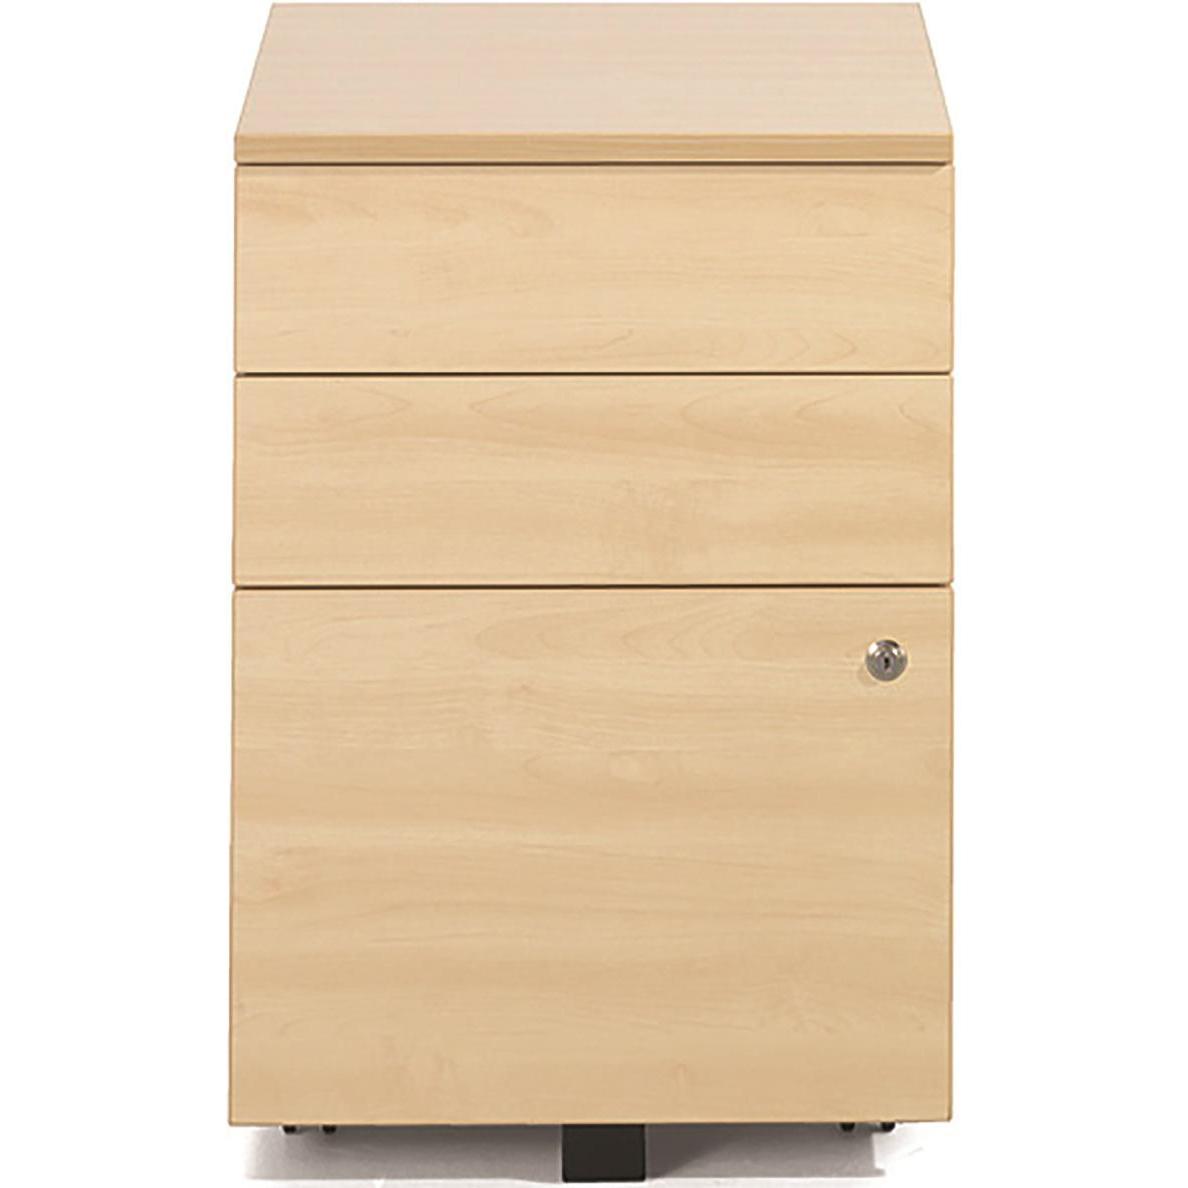 Sonix Tall UnderDesk Mobile Pedestal 430x575x631mm Acer Maple Ref w9961m